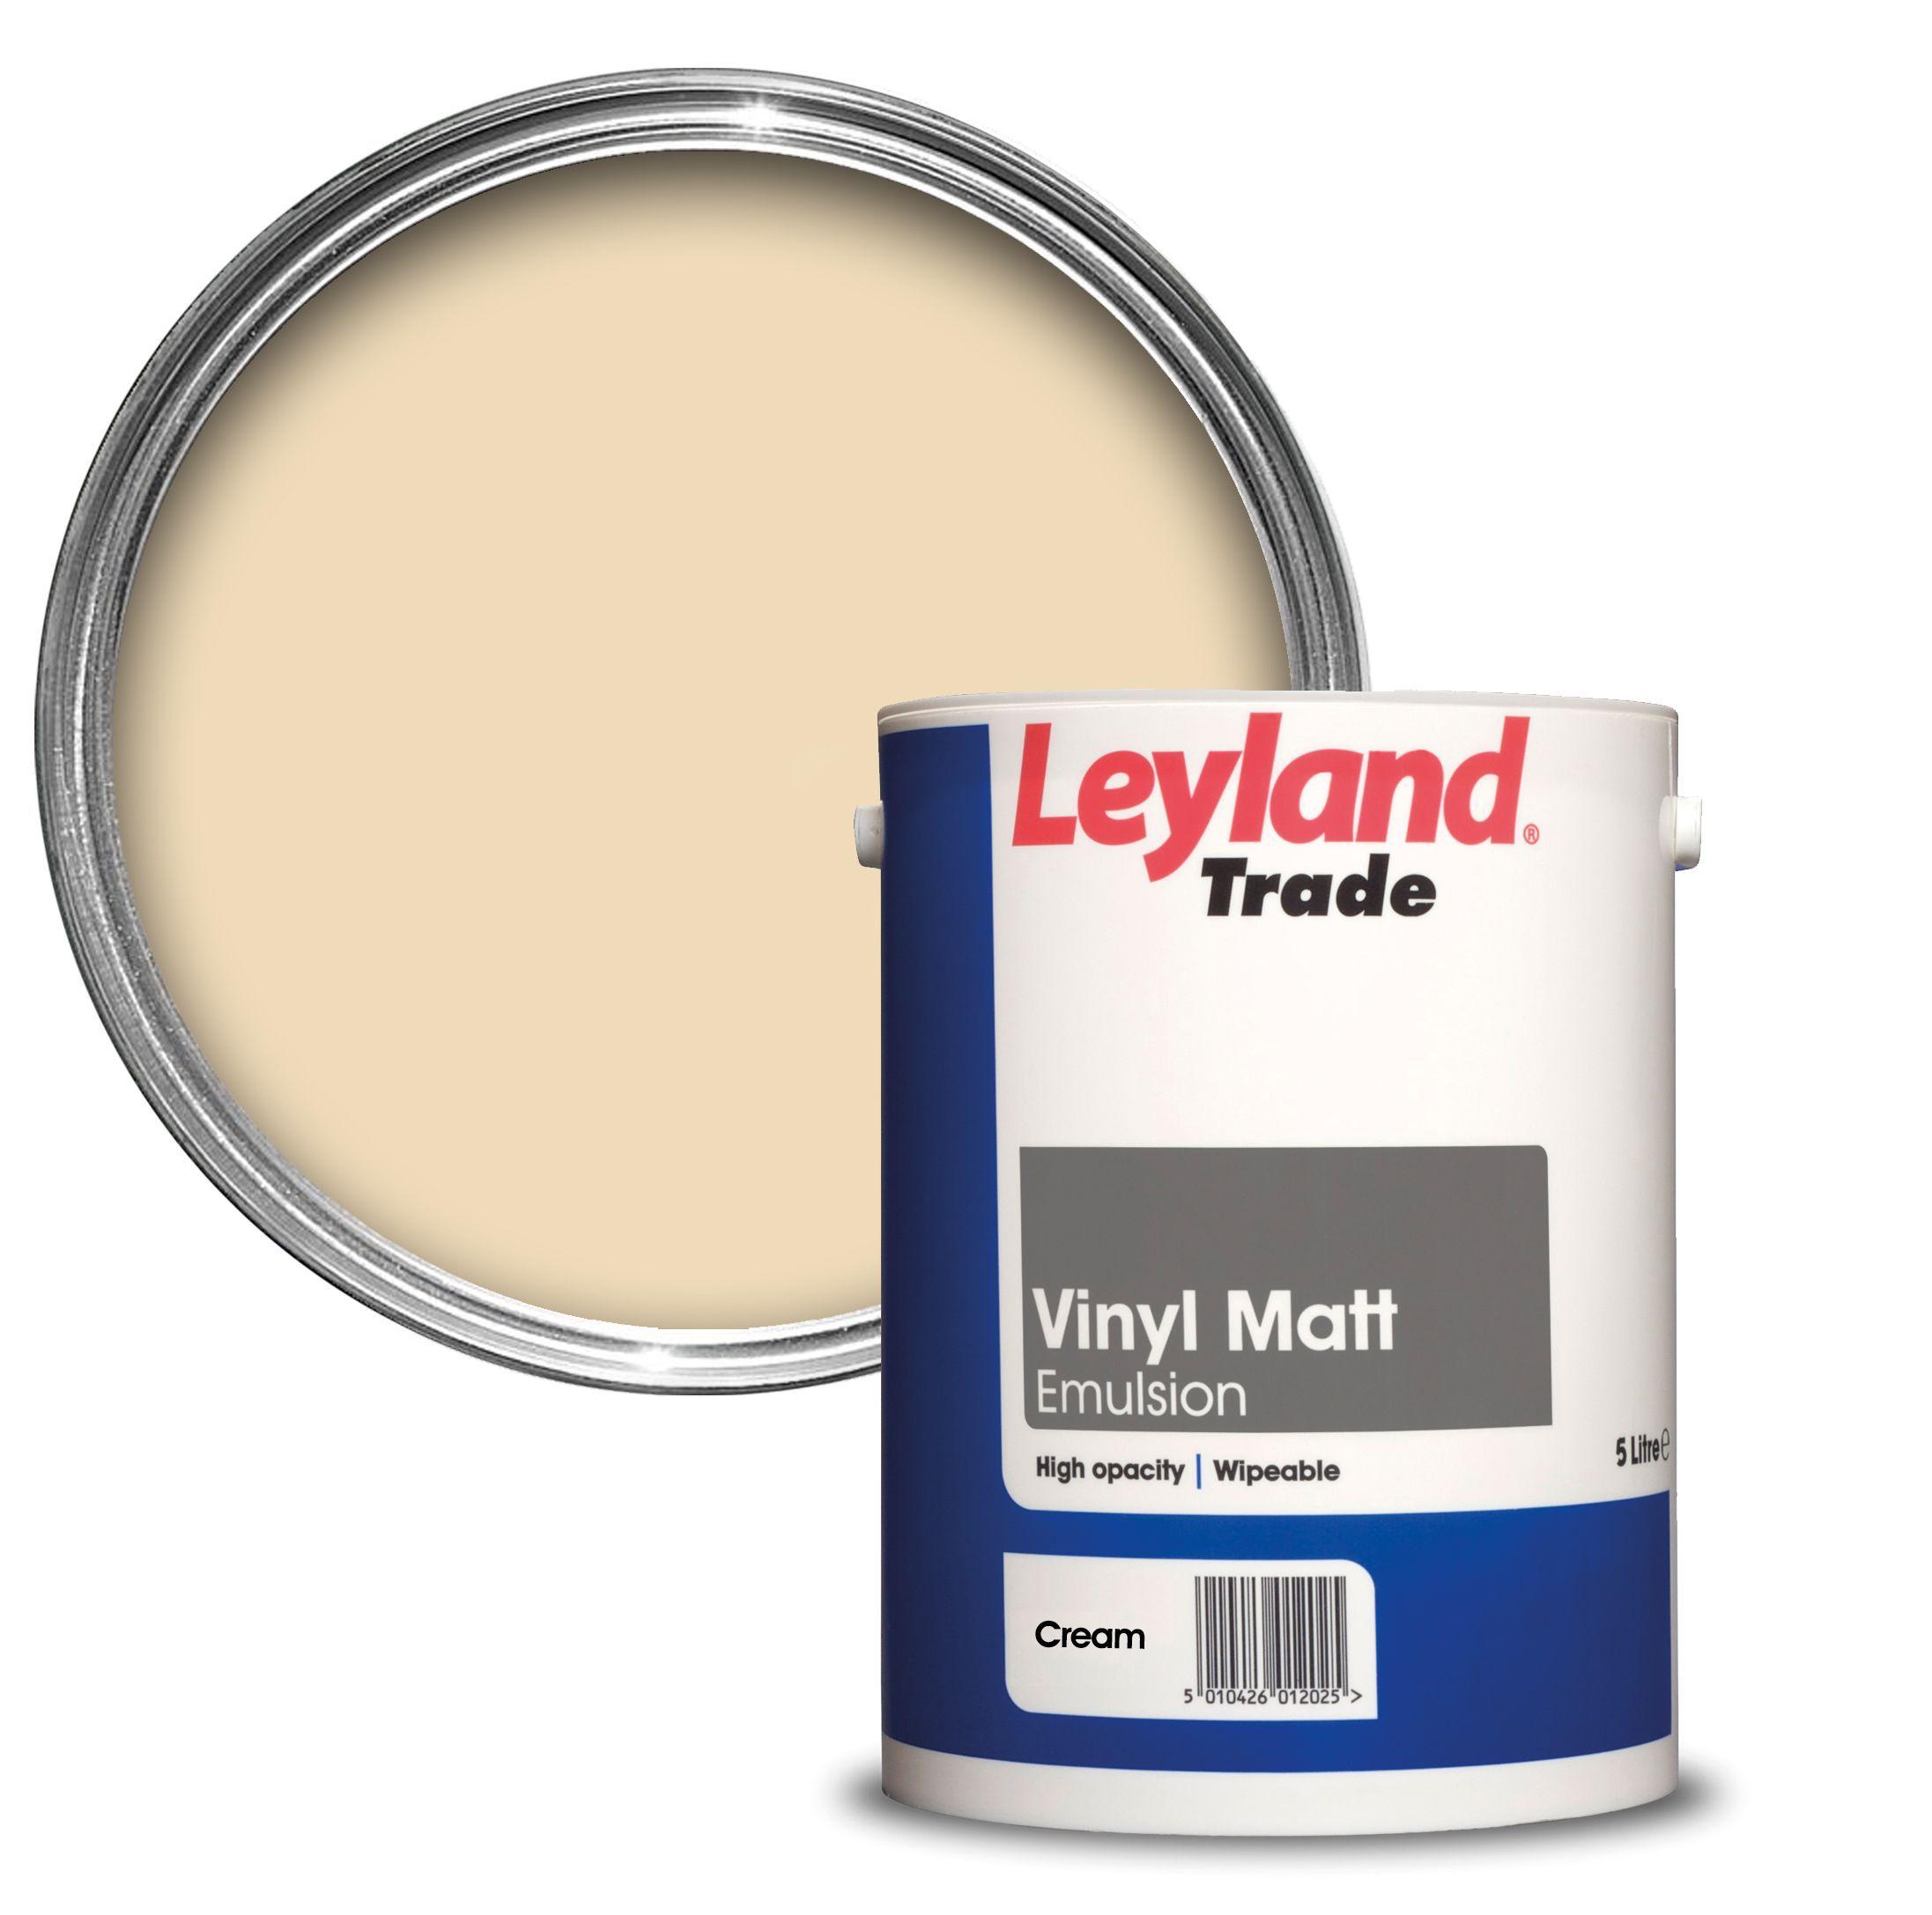 Leyland paints colour chart - Leyland Trade Cream Smooth Matt Emulsion Paint 5l Departments Diy At B Q